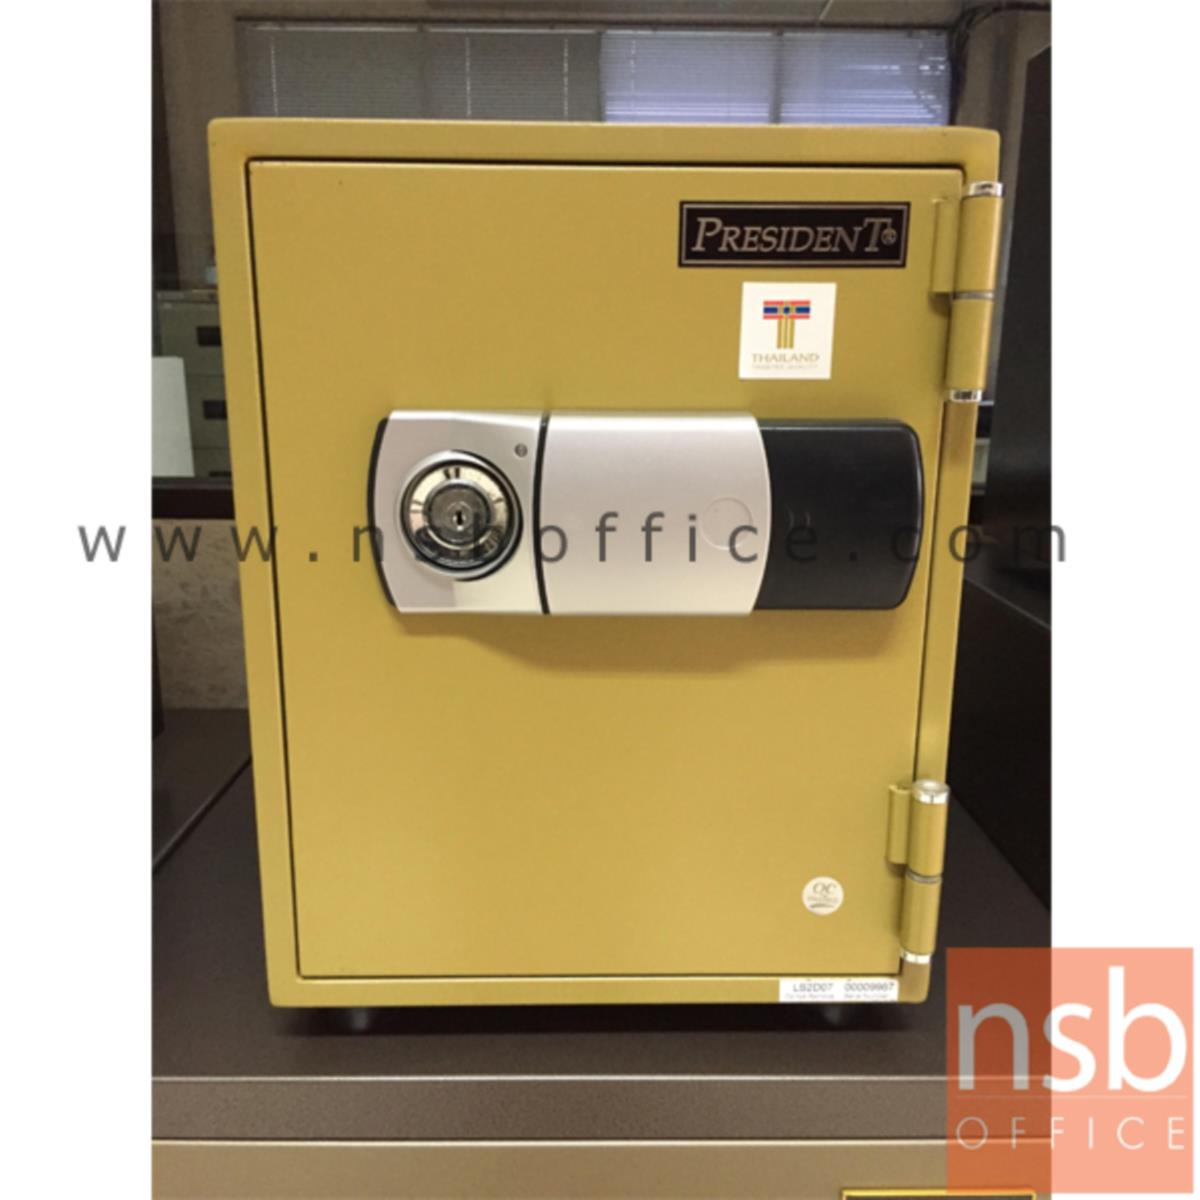 F05A021: ตู้เซฟนิรภัยชนิดดิจิตอล 28 กก. รุ่น PRESIDENT-LS2D   มี 1 กุญแจ 1 รหัส (รหัสใช้กดหน้าตู้)